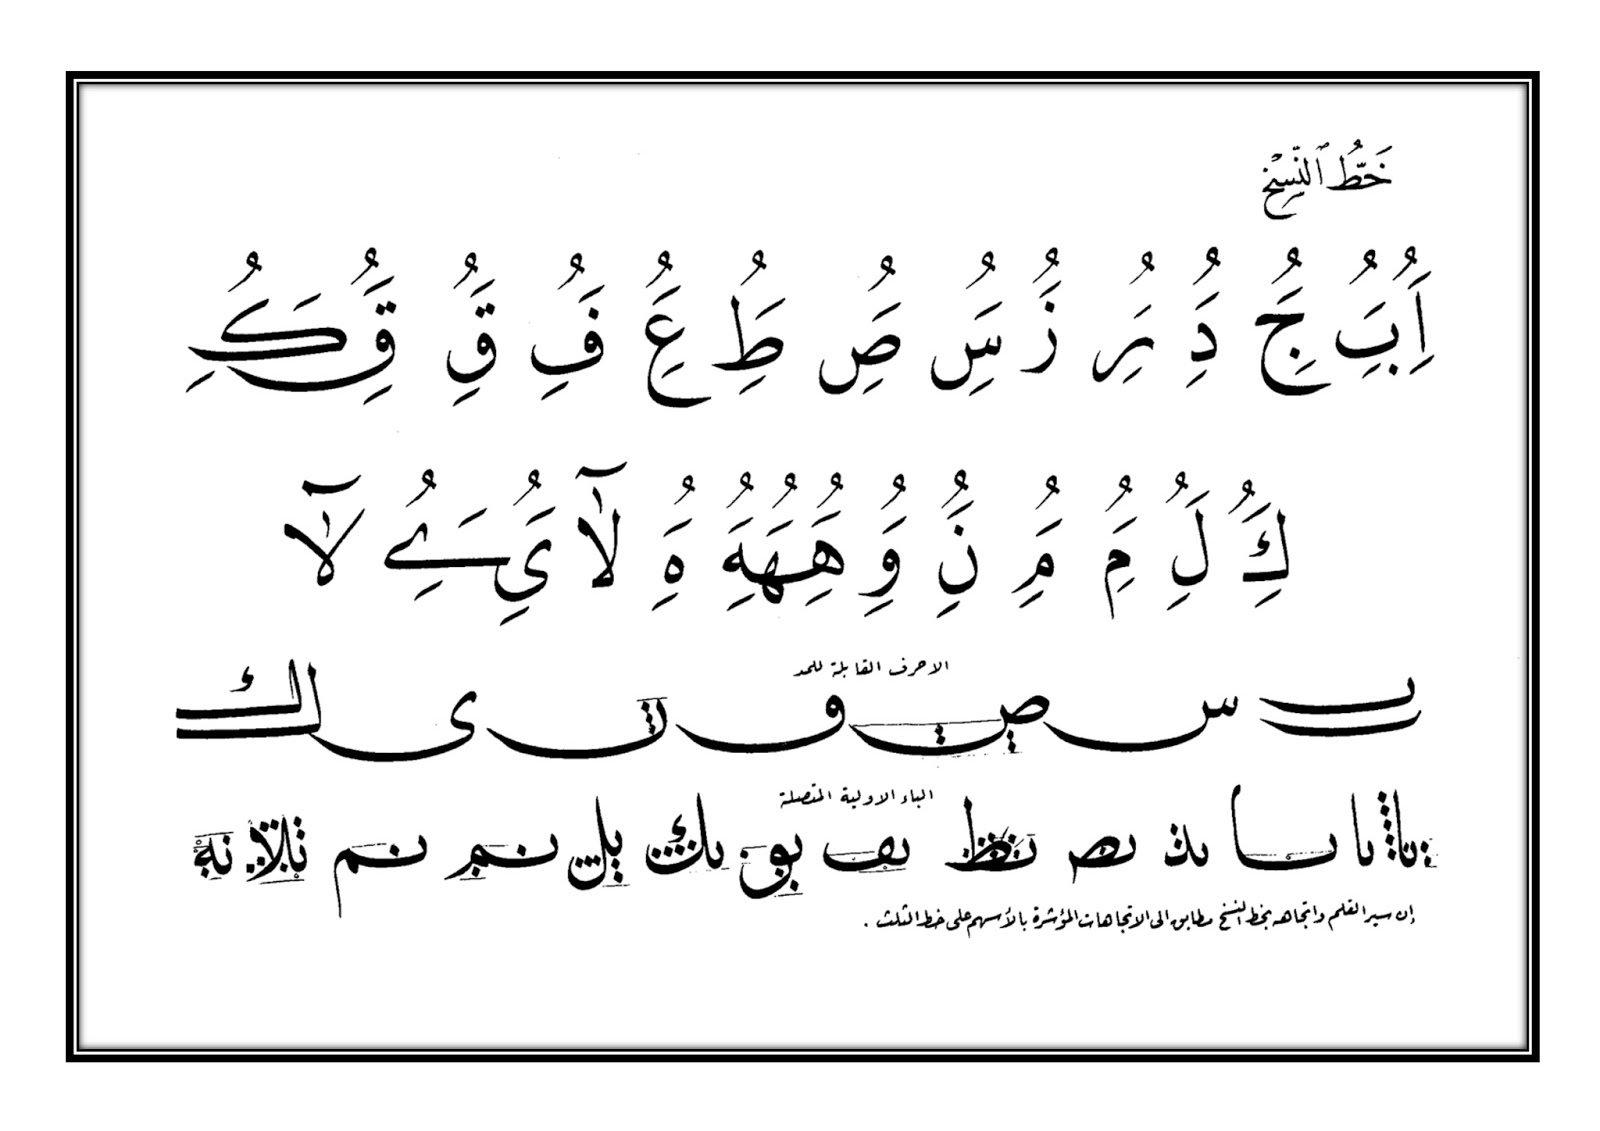 6 Jenis Hiasan Kaligrafi Arab Untuk Dekorasi Dinding Rumah Yang Cantik